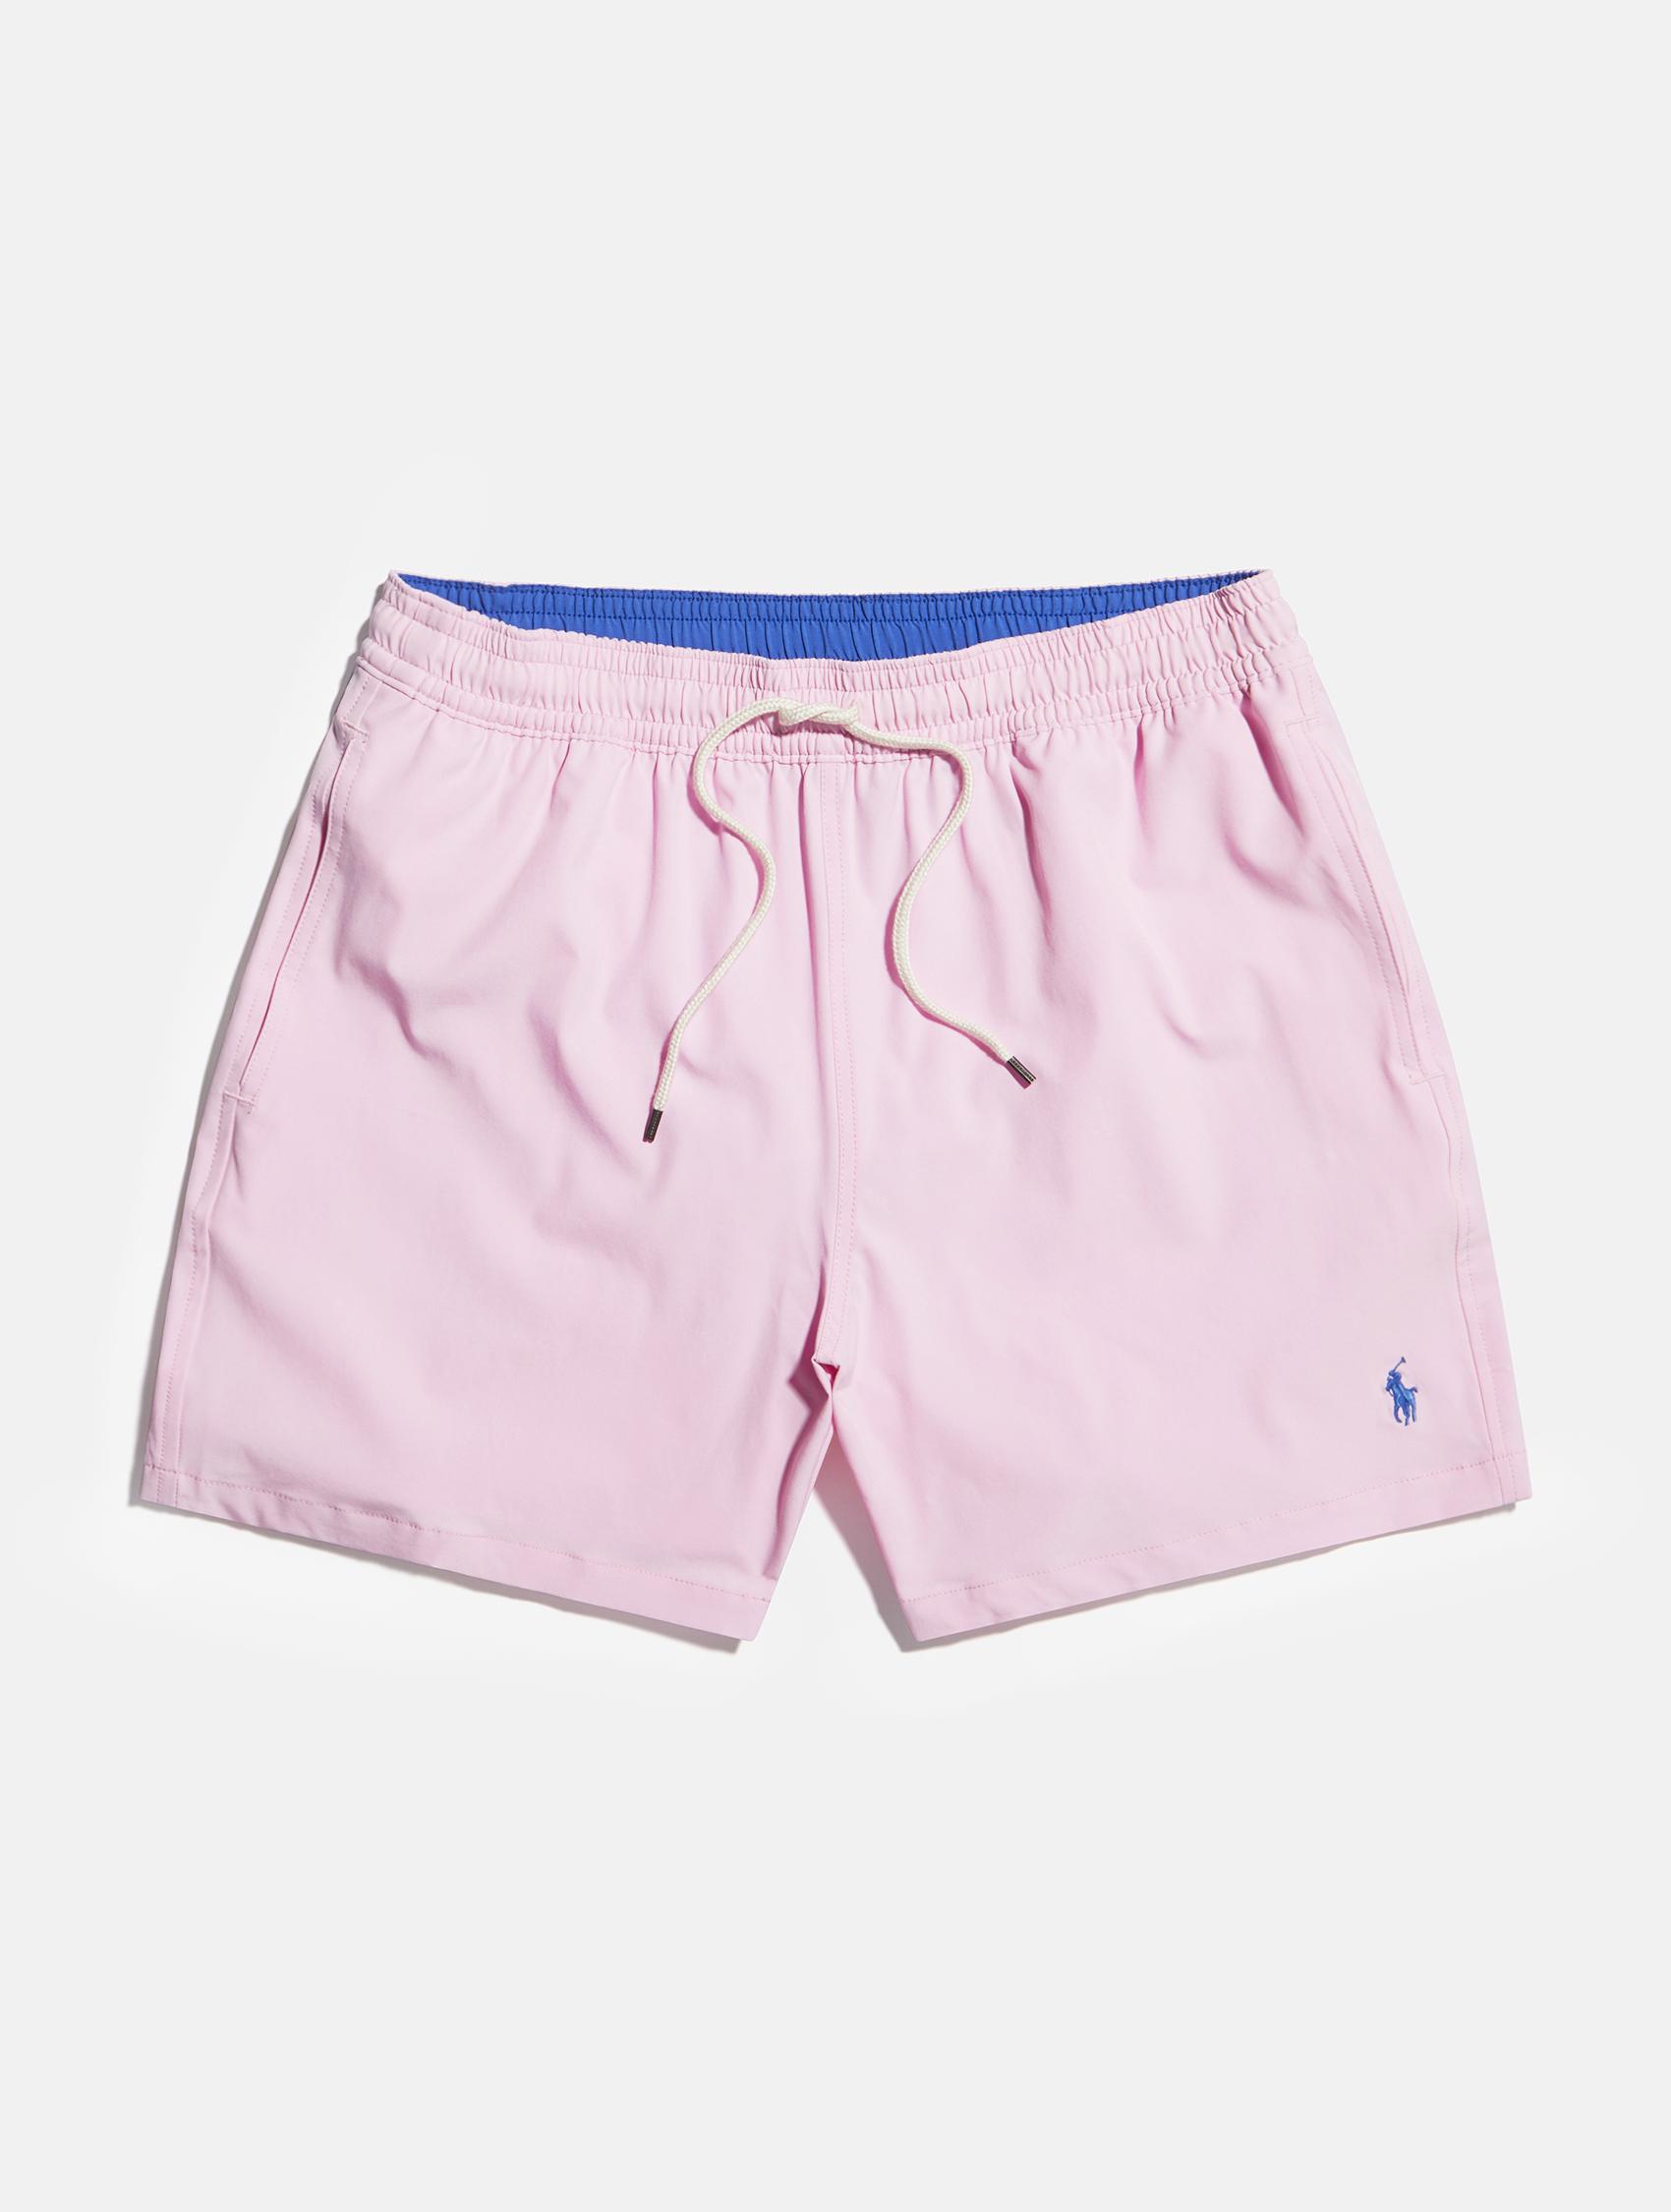 Light pink with blue detailing Ralph Lauren swimming shorts